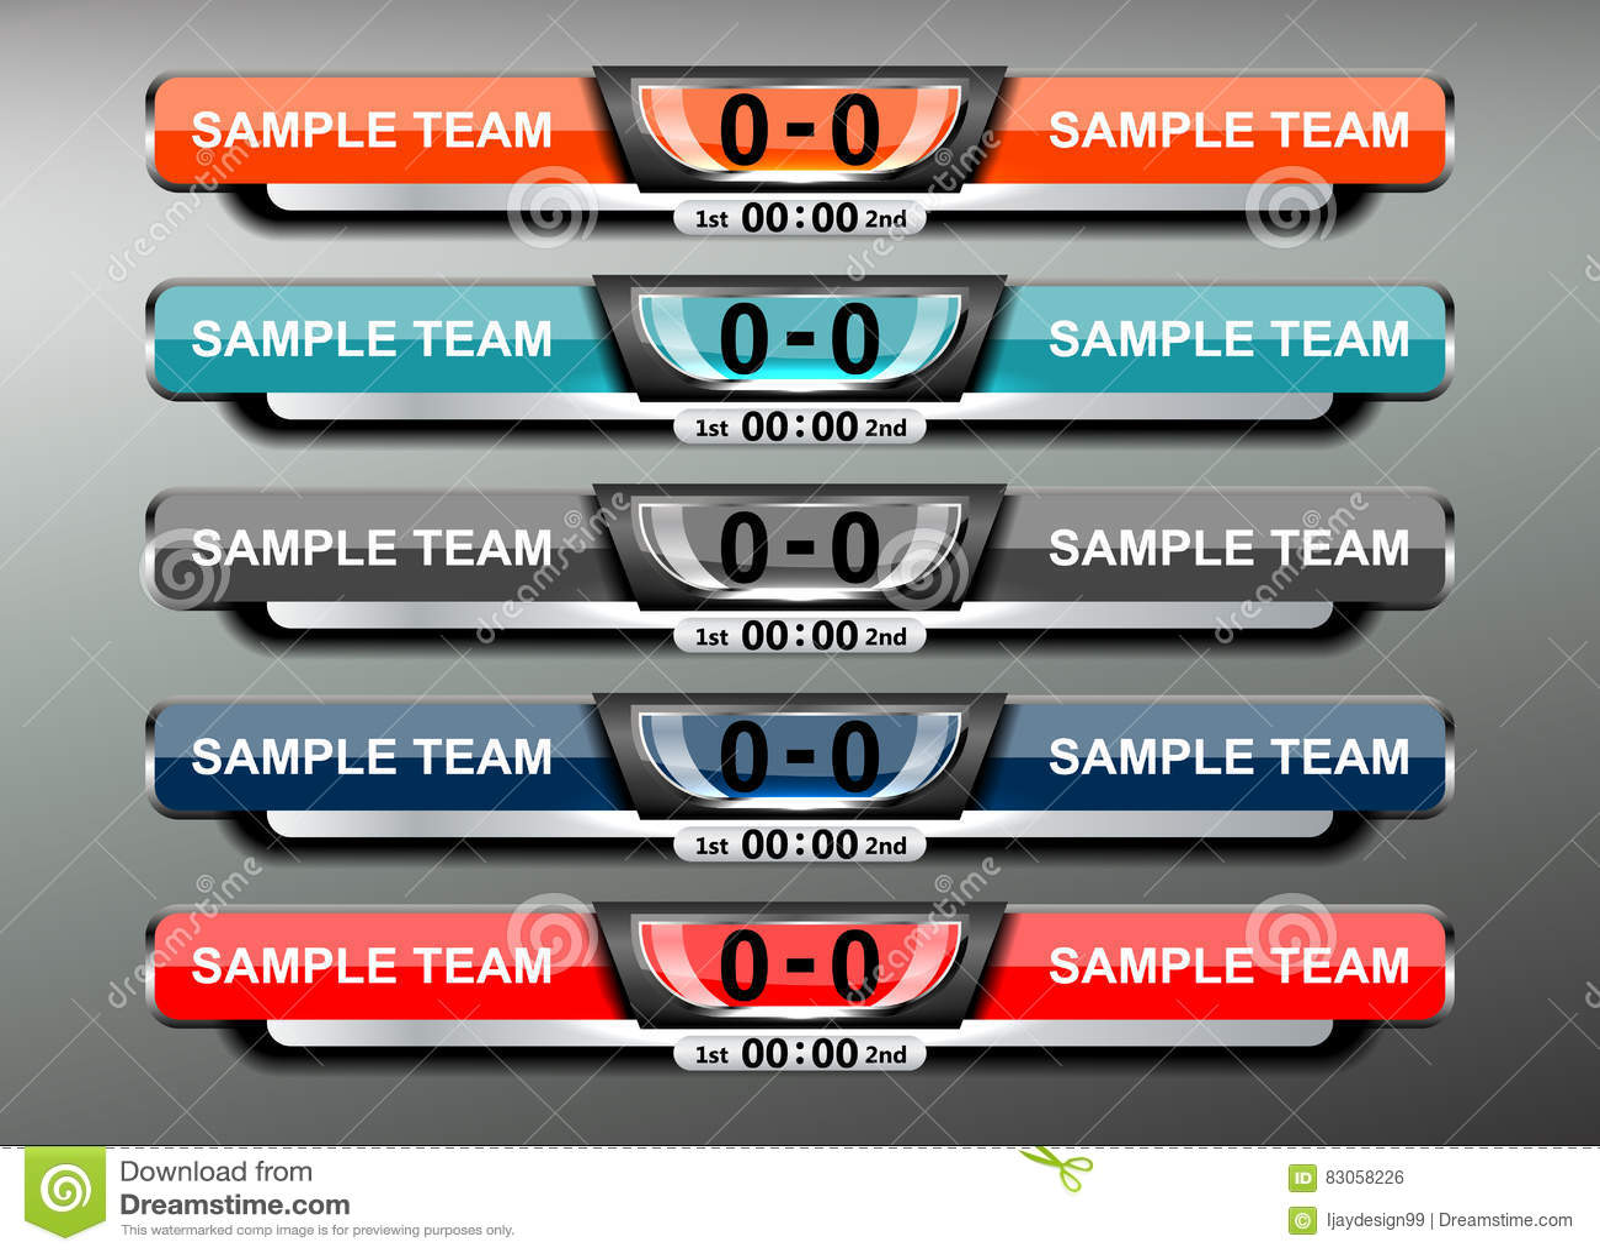 Scoreboard Soccer Design Vector Image 83058226 – Scoreboard Sample